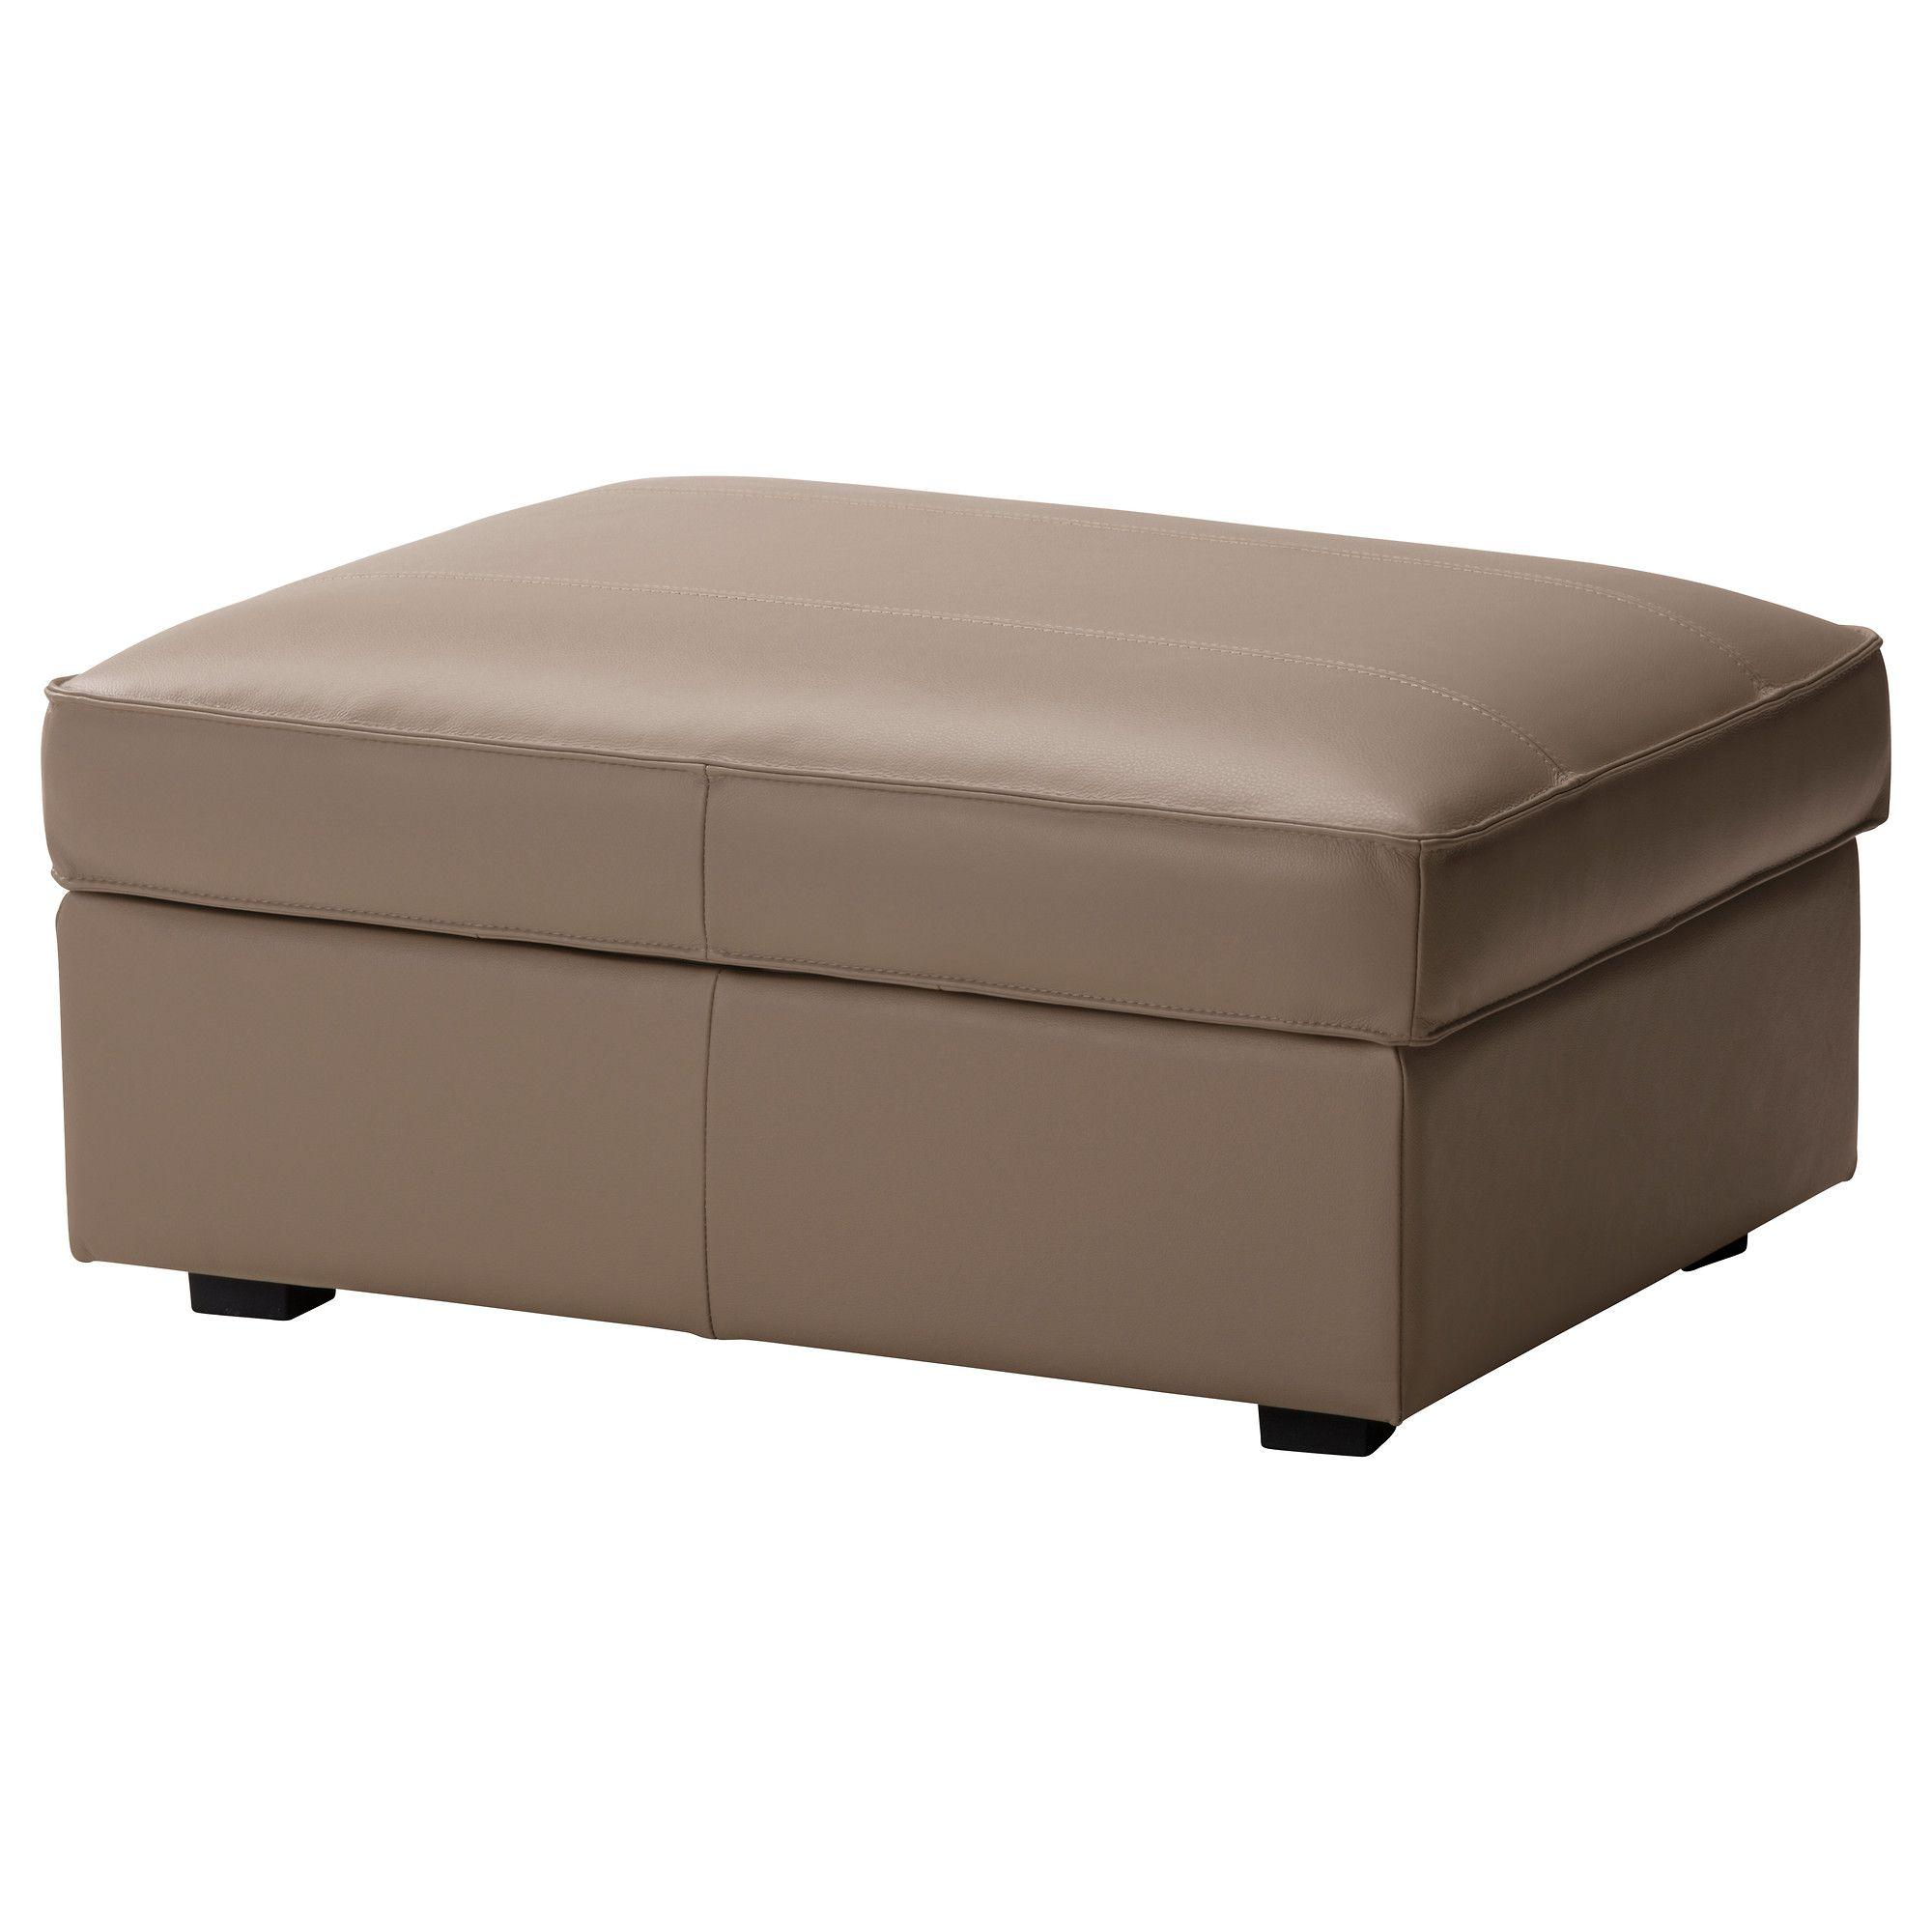 Ottoman bed ikea - Pouf Ottoman Ikea With Modern Leather Square Pouf Ottoman Design